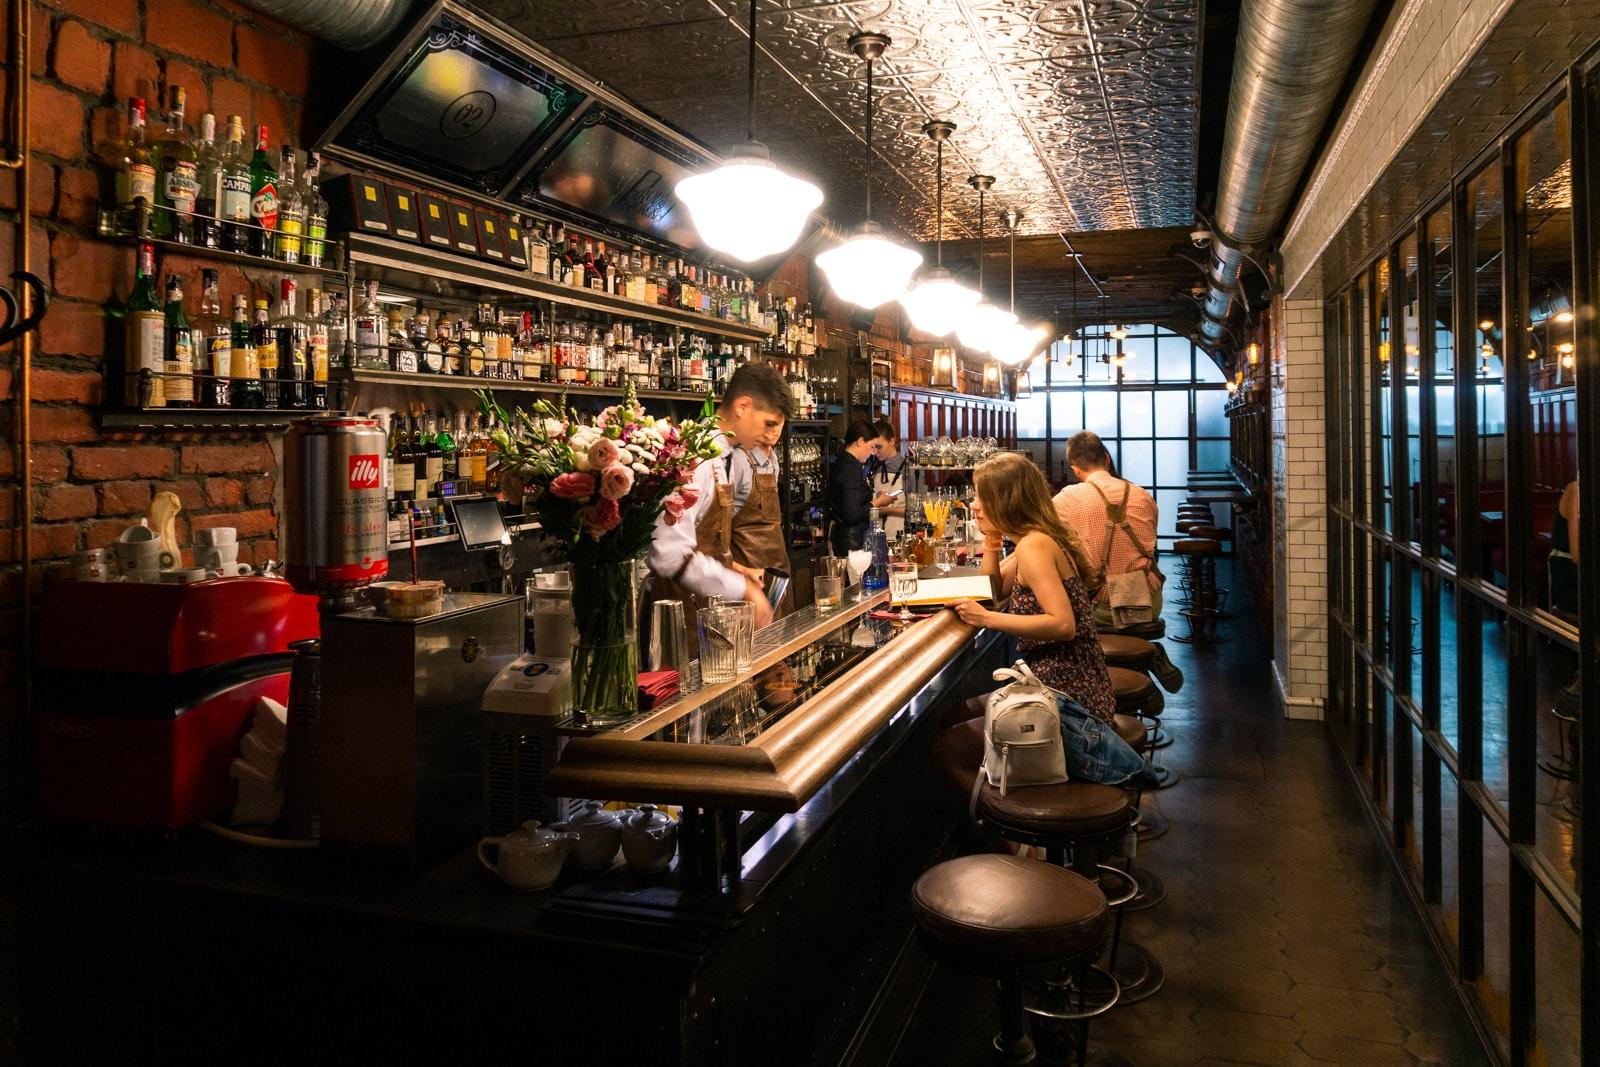 Interior del bar Parovoz en Kiev, Ucrania